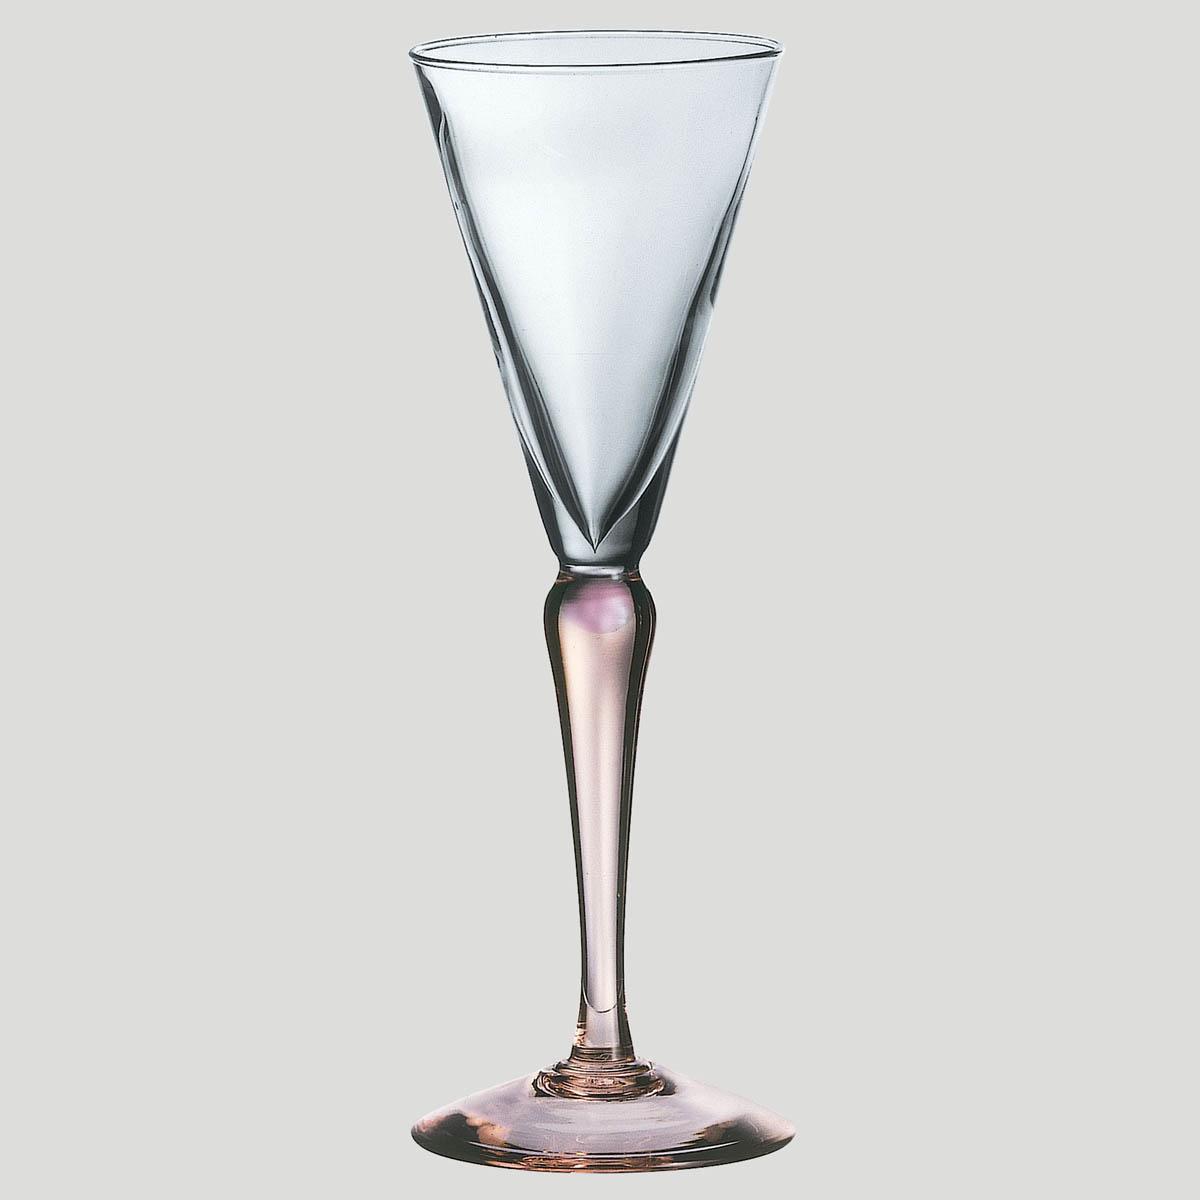 Super Edelweiss - Coppe per gelato in vetro - Gardagel